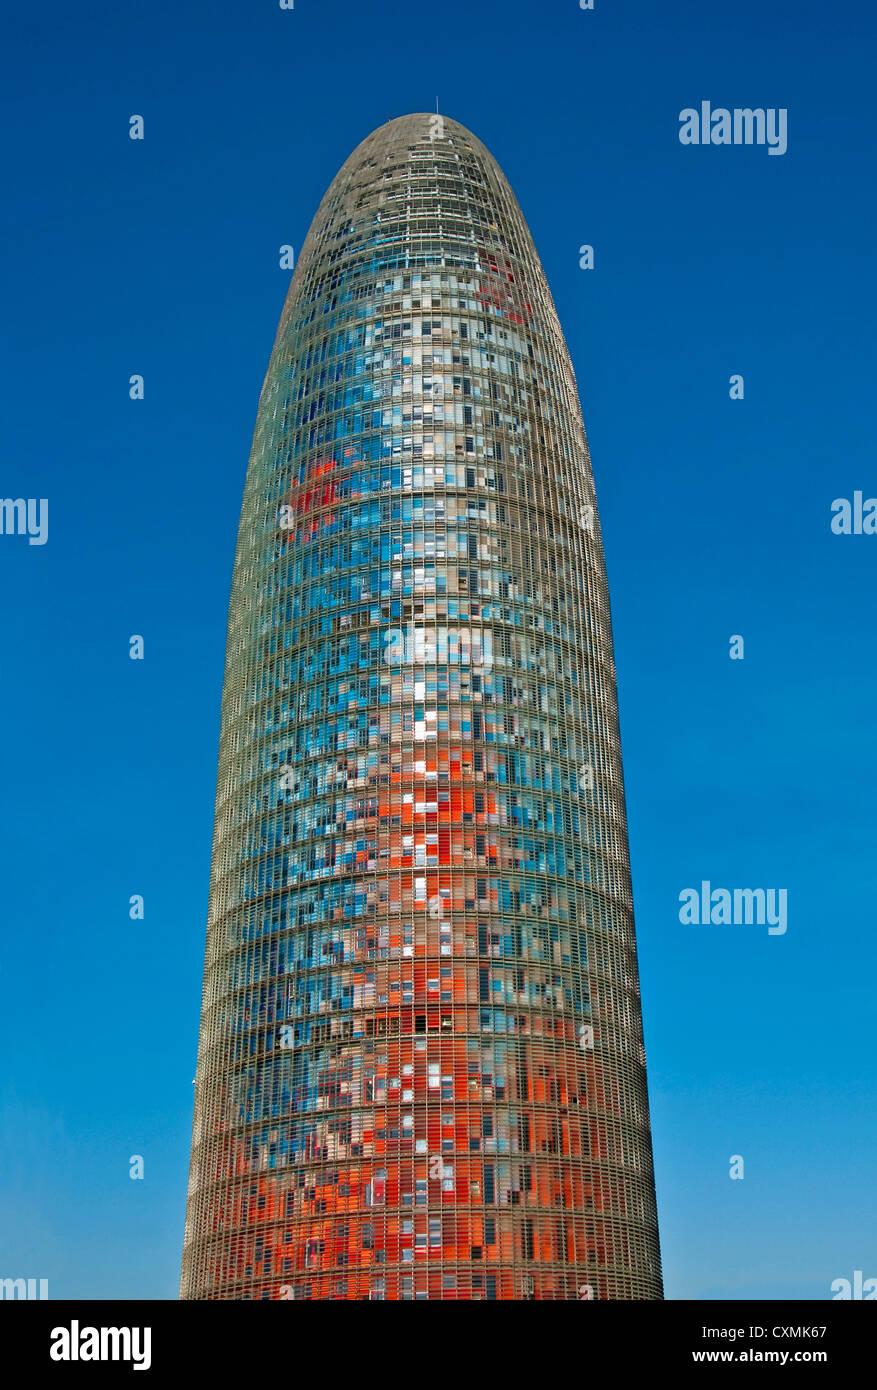 Barcelona's Akbar Tower by Jean Nouvel houses Aguas de Barcelona, the municipal water company headquarters - Stock Image